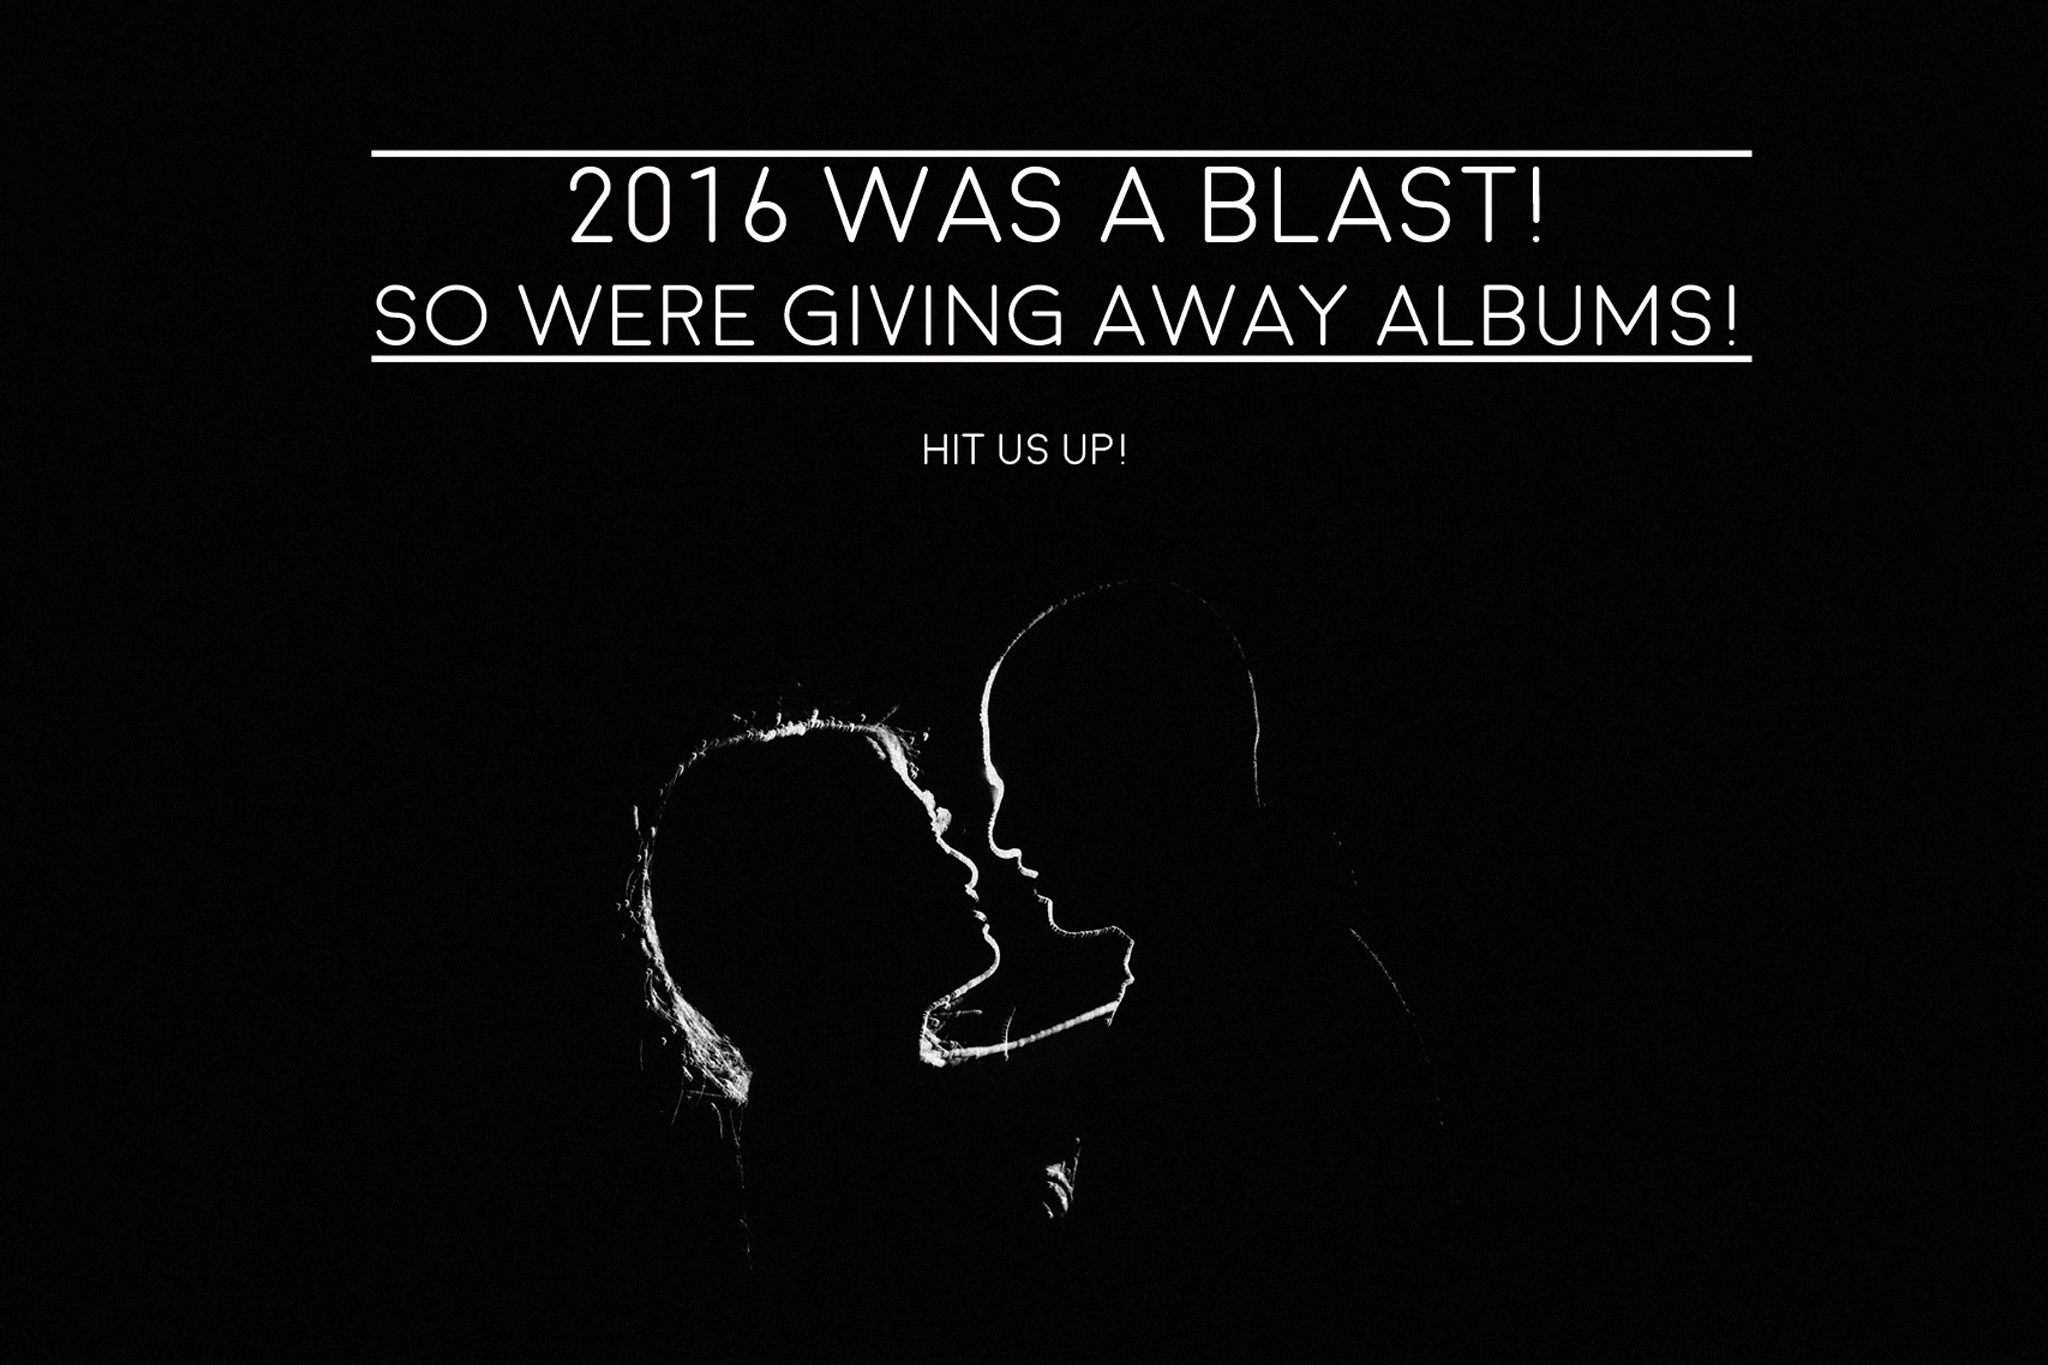 Album give away promo!